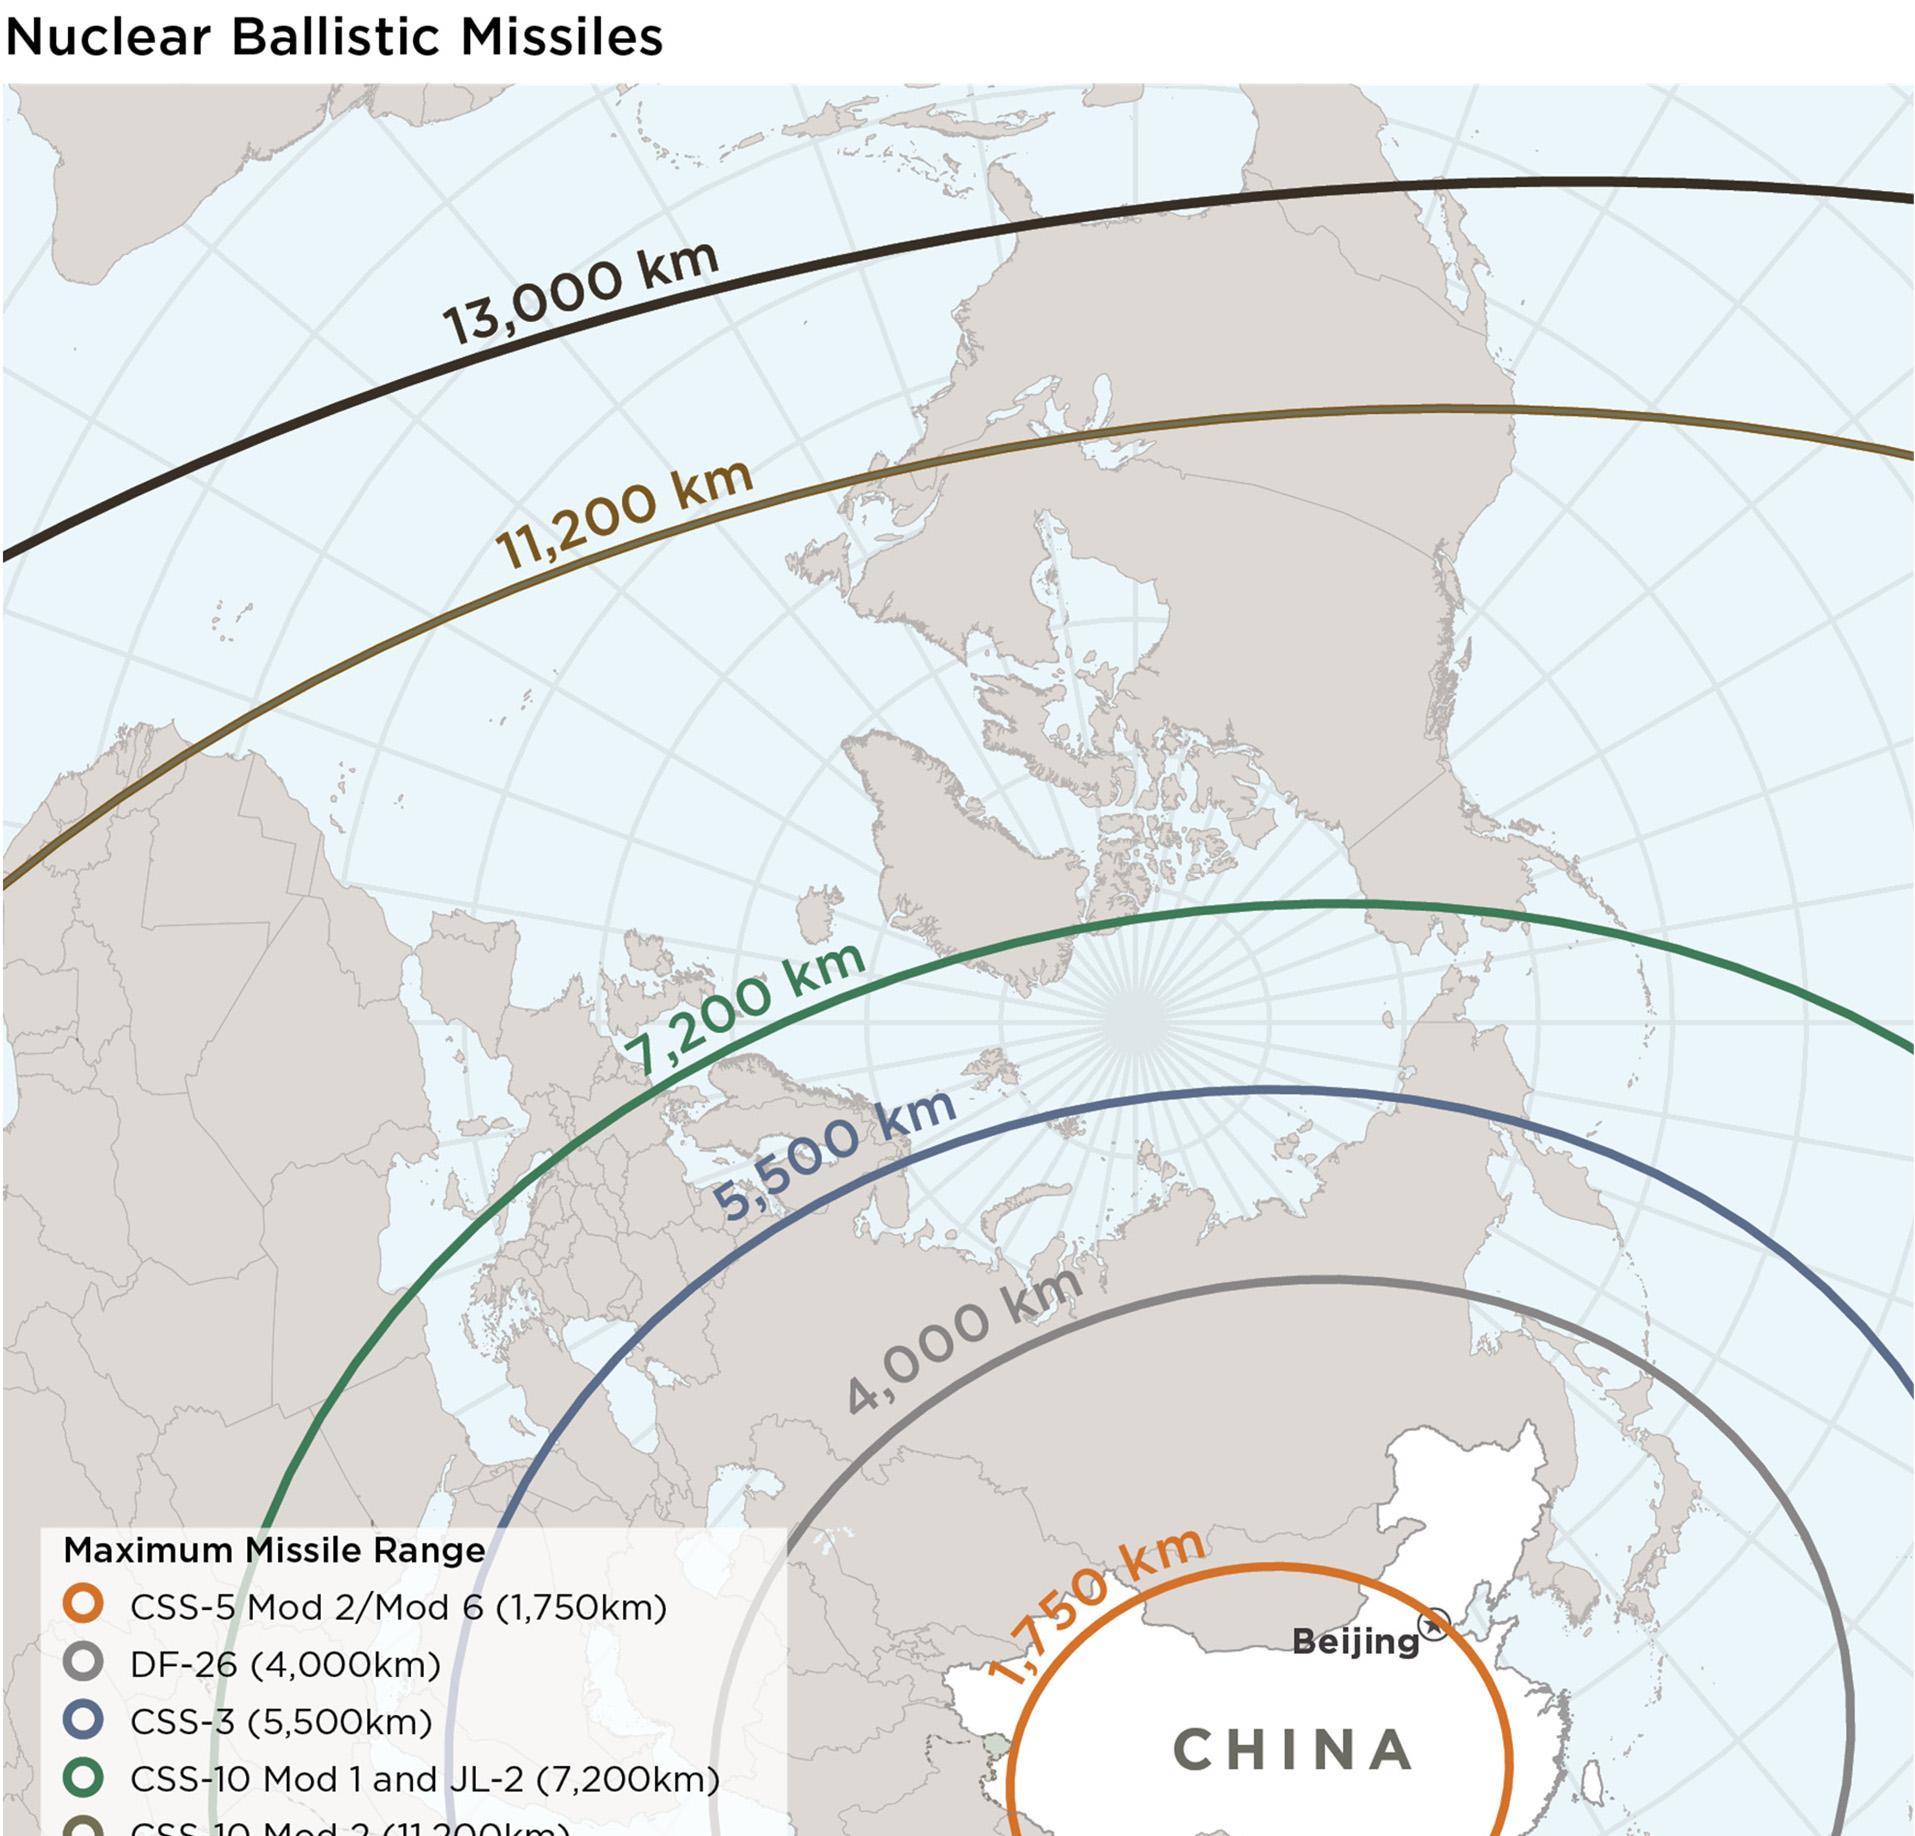 Nuclear ballistic missiles